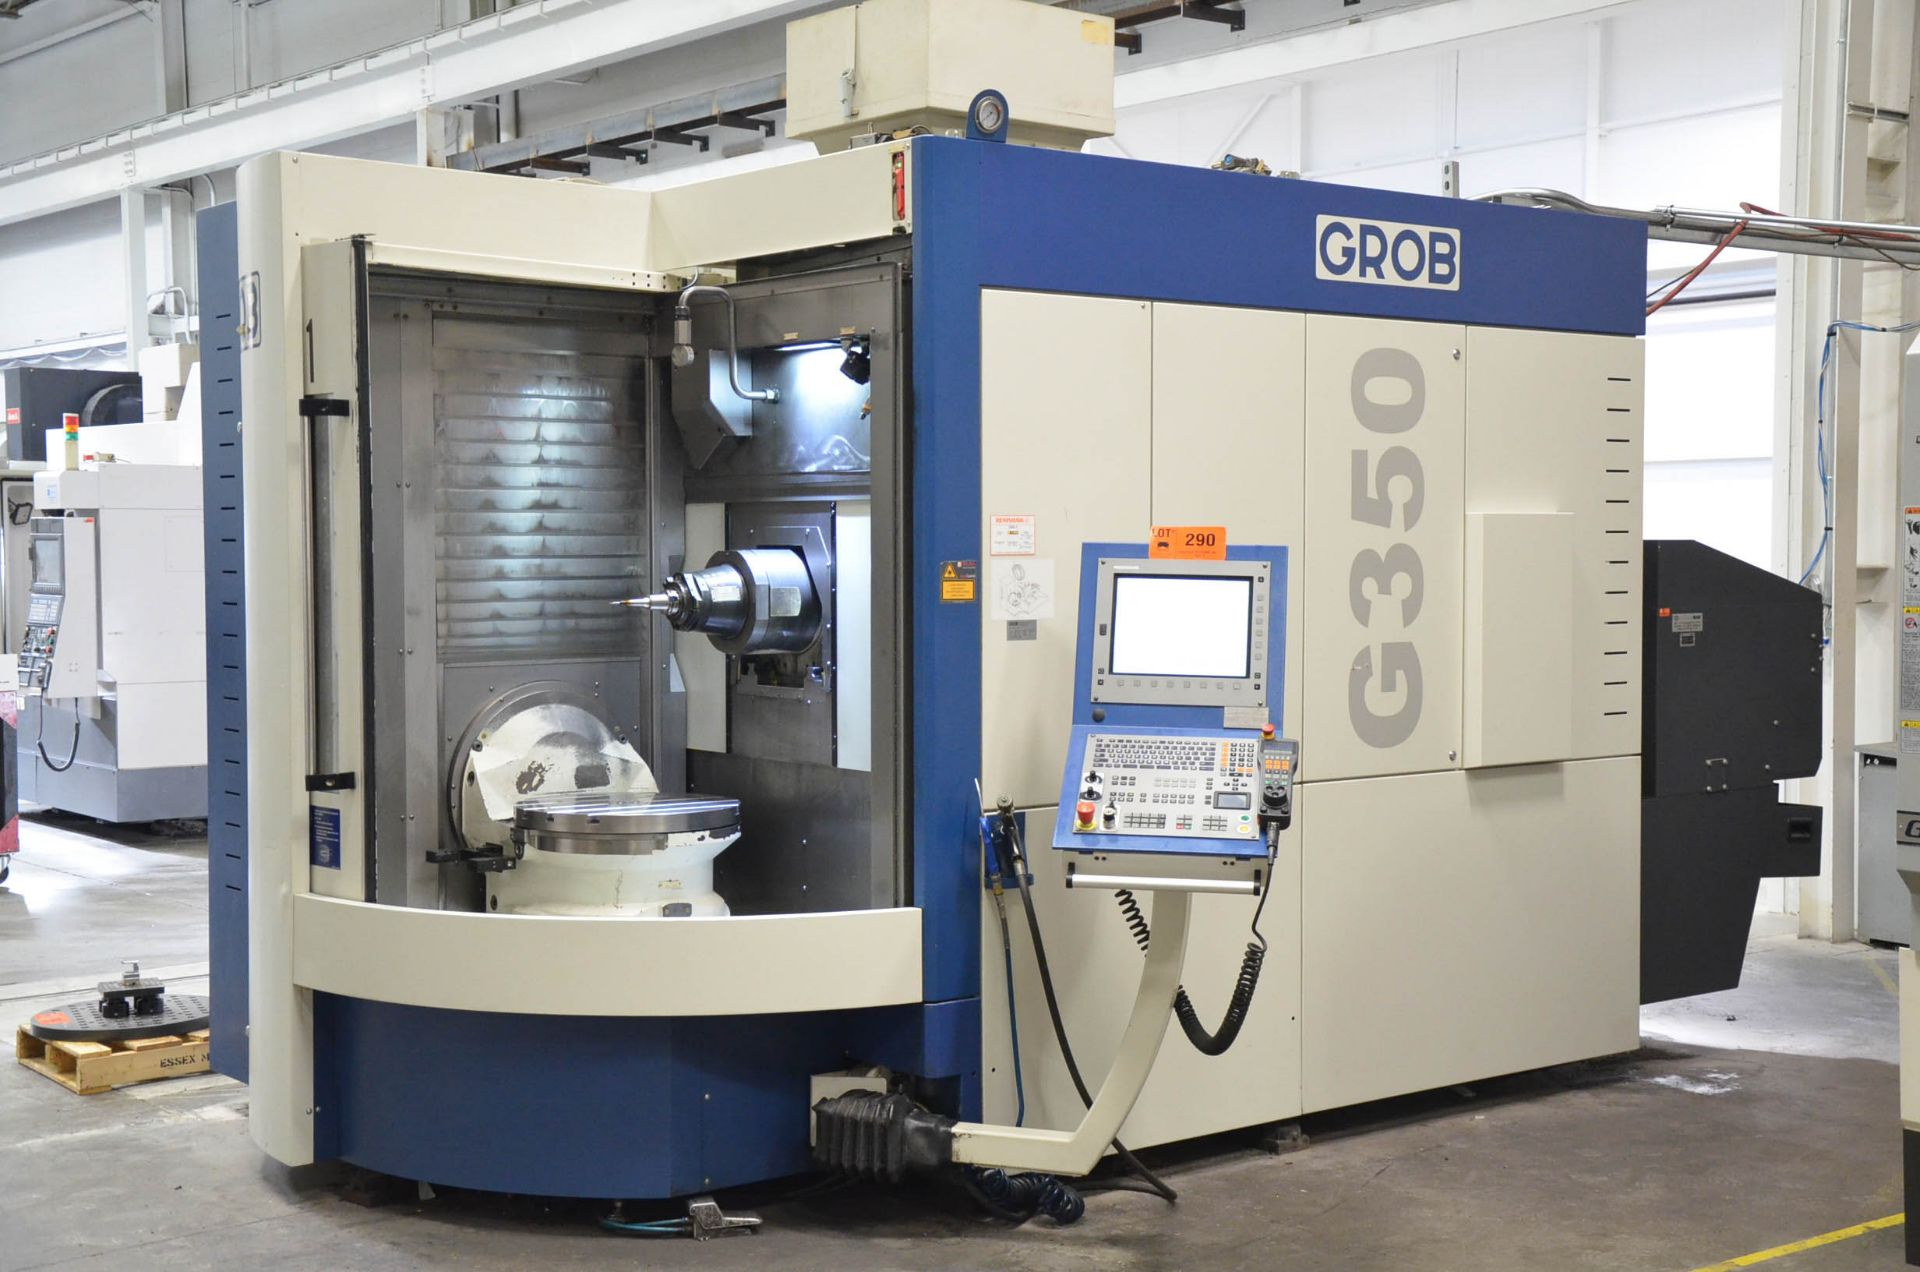 "GROB (2012) G350 5-AXIS CNC MACHINING CENTER WITH HEIDENHAIN ITNC 530 CNC CONTROL, 22.25"" DIAMETER - Image 2 of 12"